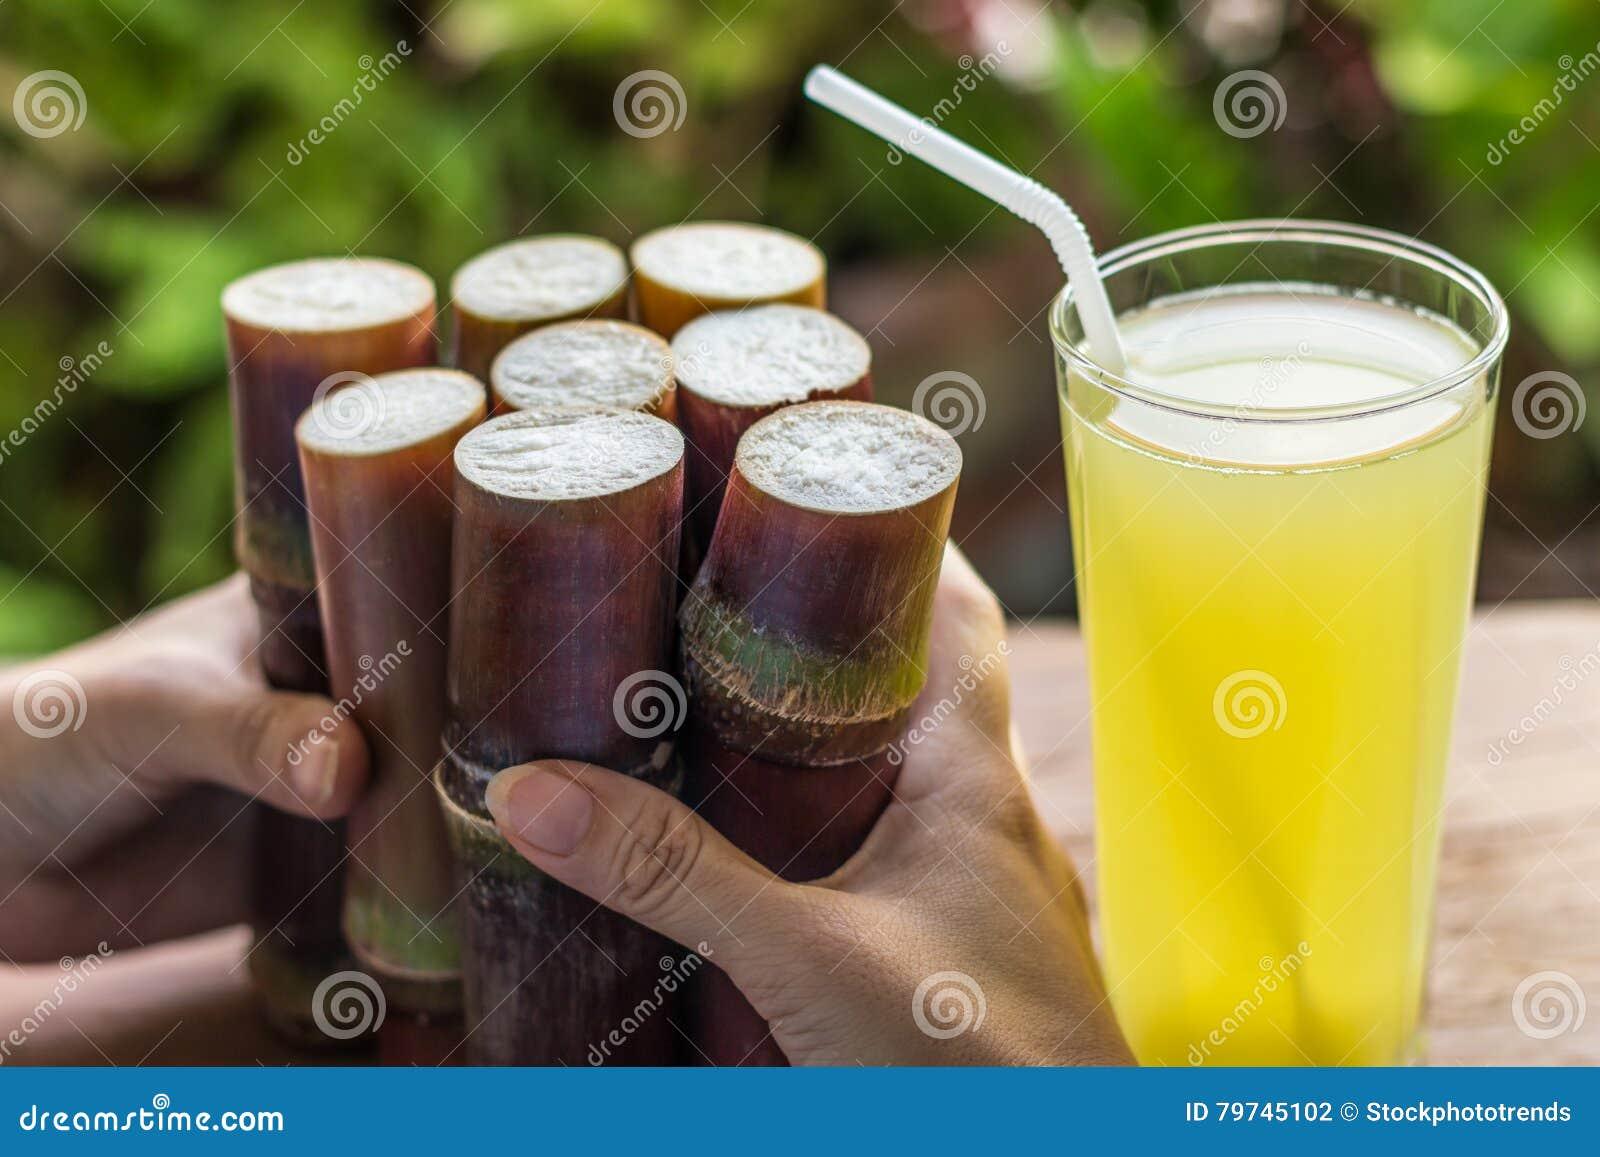 Jugo fresco para la consumición sana, comida fresca de la caña de azúcar para adietar